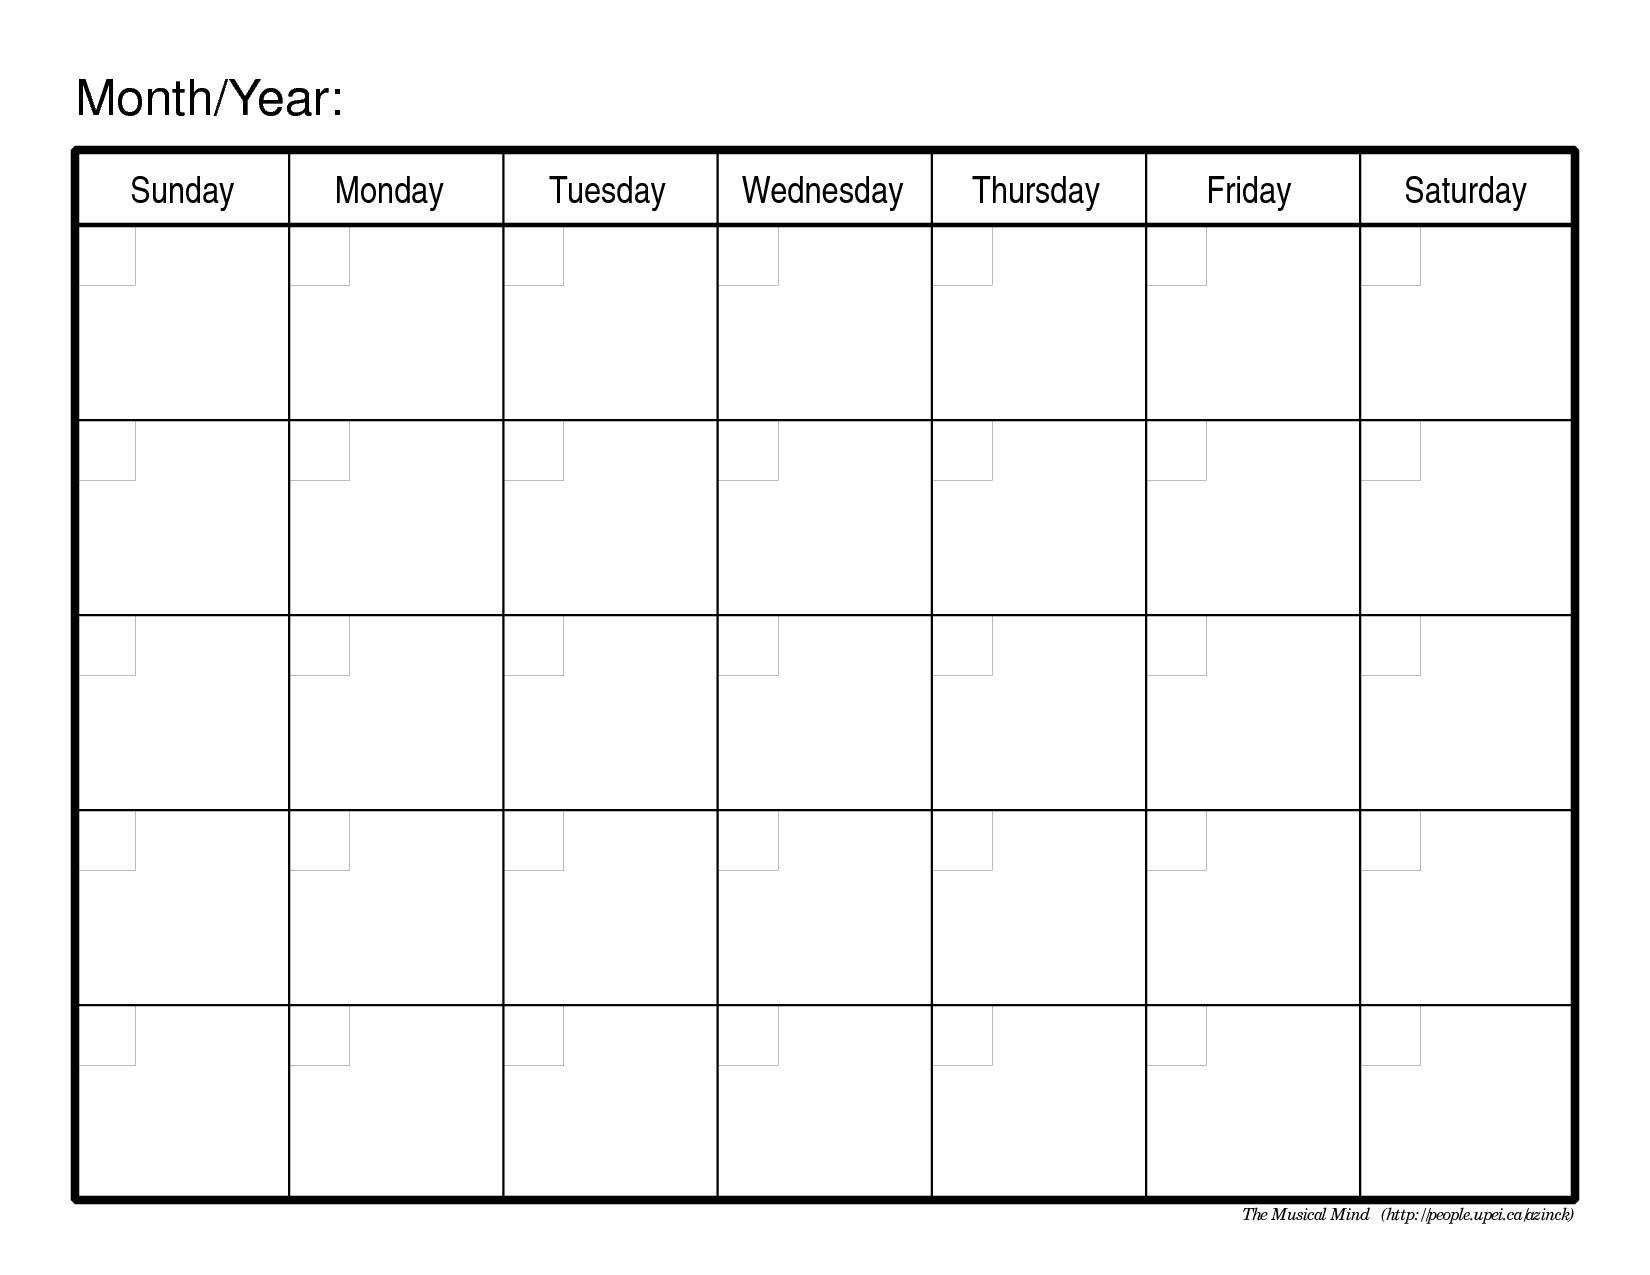 Monthly Calendar Print Out Fastlunchrockco 89uj